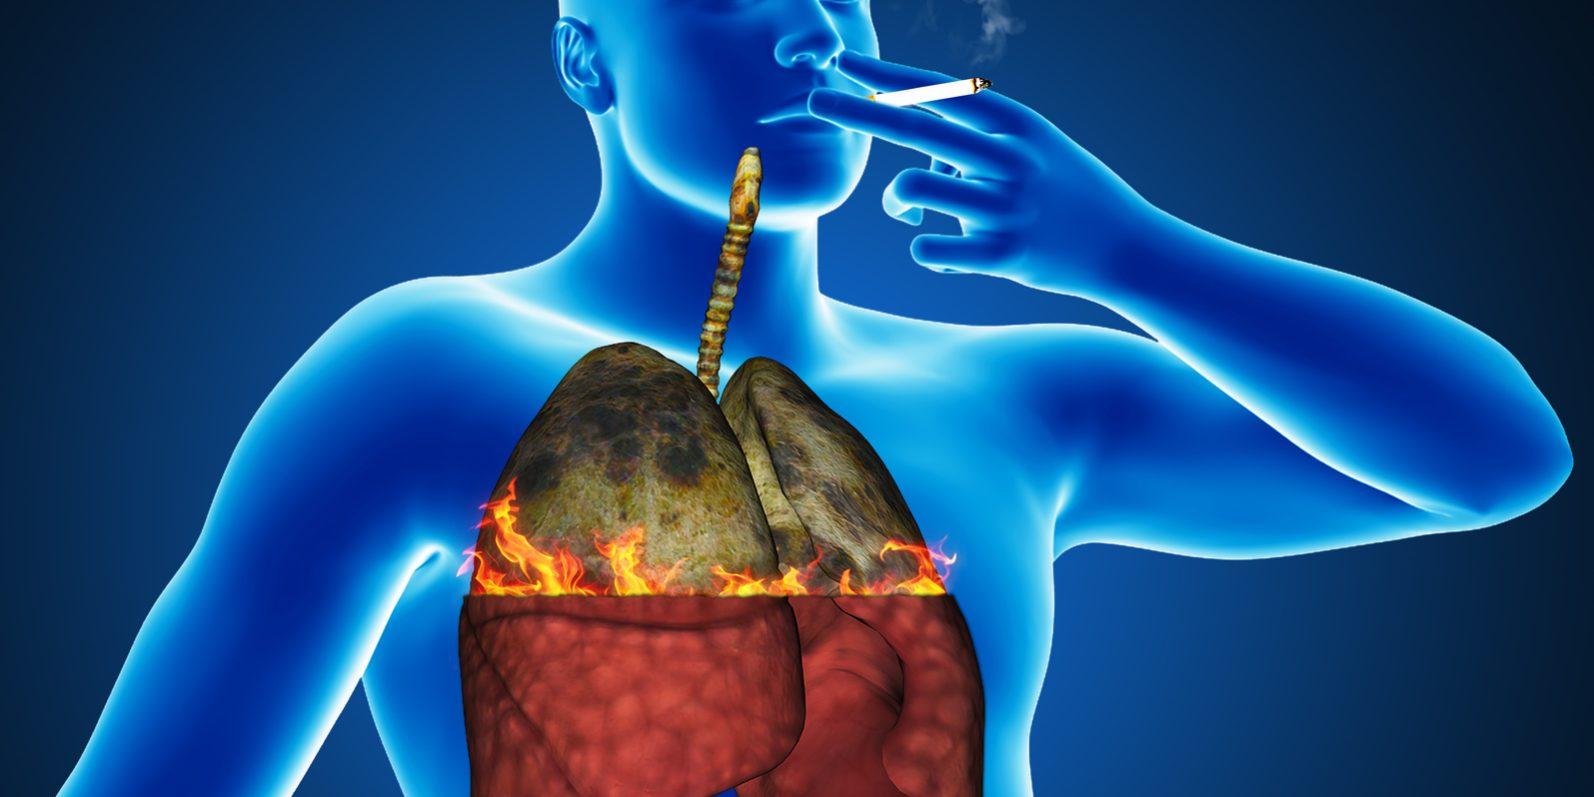 lung cancer symptoms in men